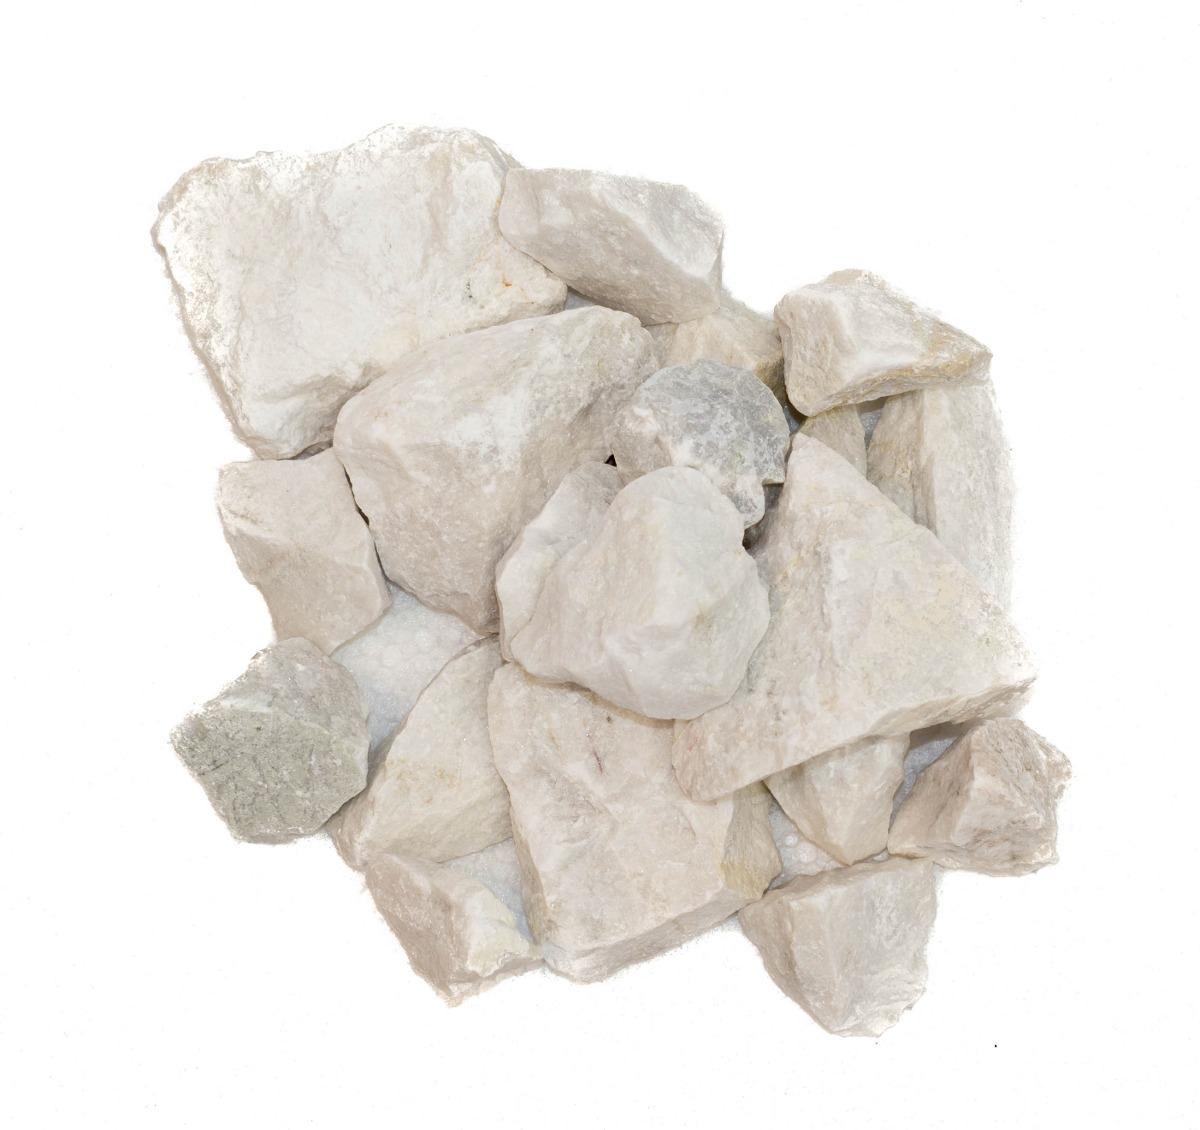 piedras decorativas para jardines chimeneas bioetanol